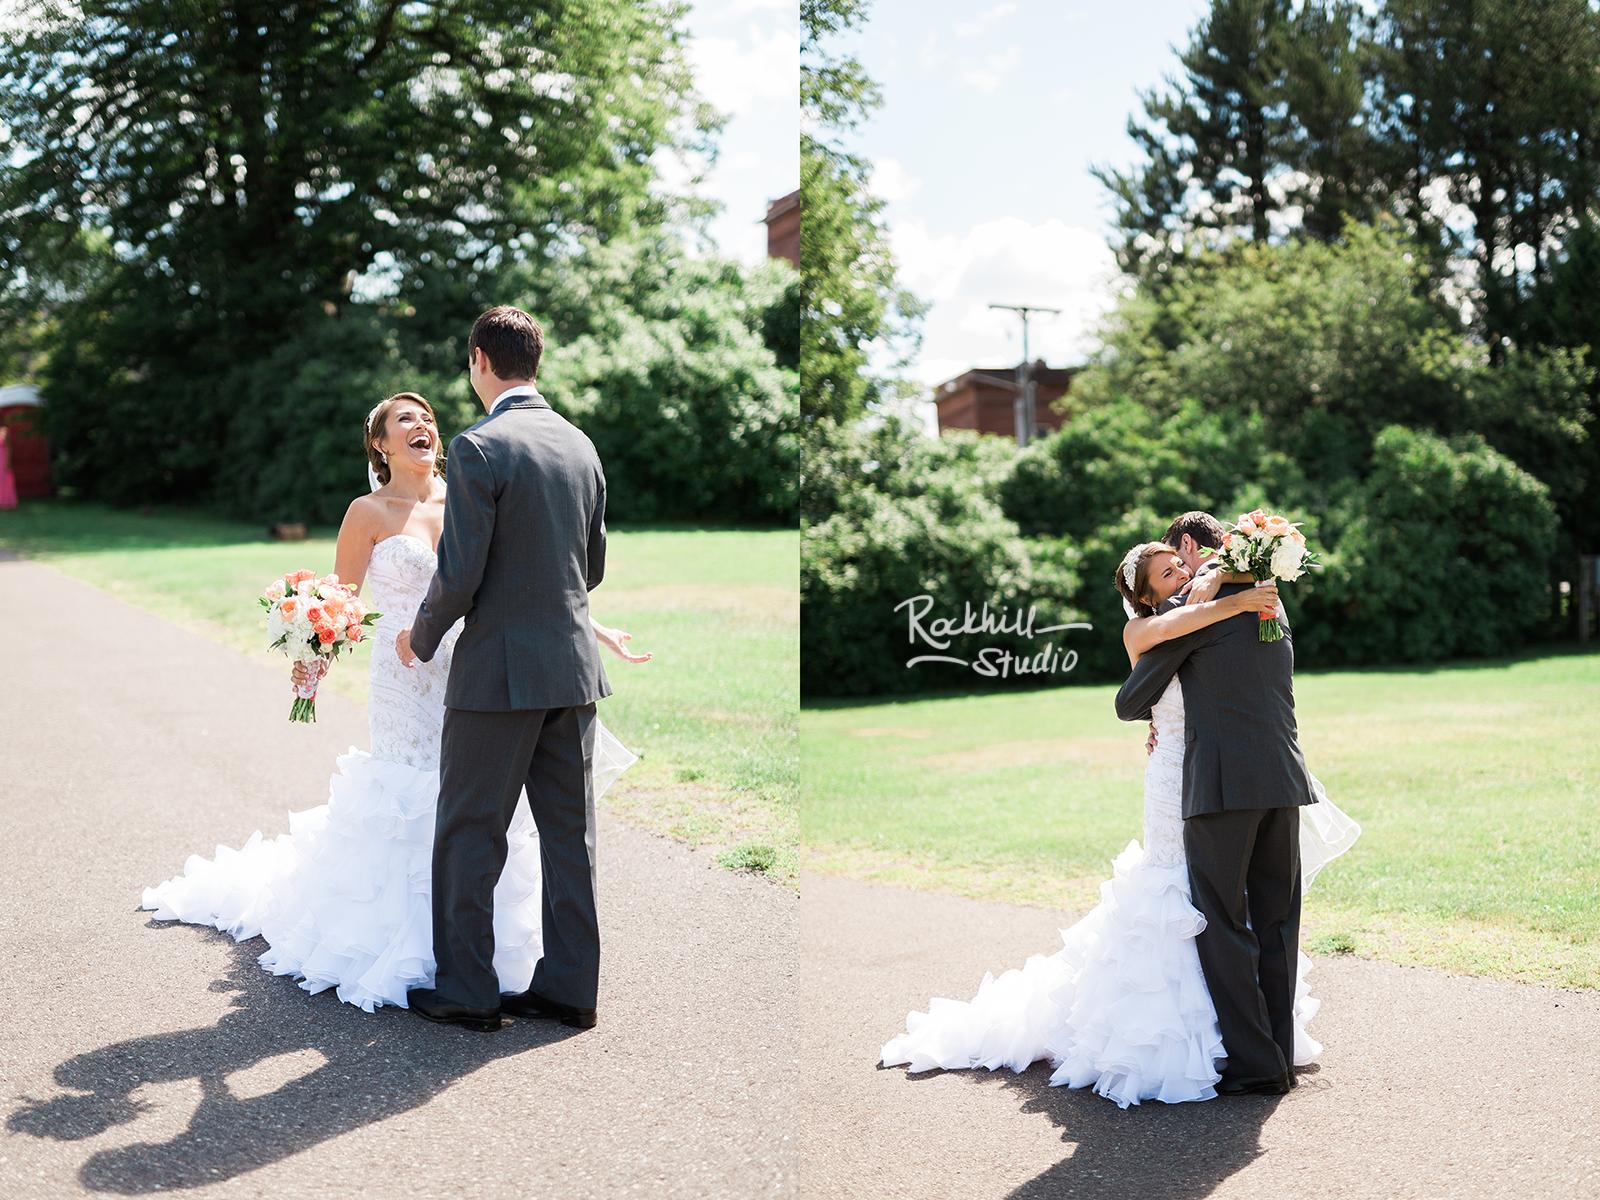 marquette-wedding-upper-peninsula-northern-michigan-wedding-ck-photography-firstlook-2.jpg